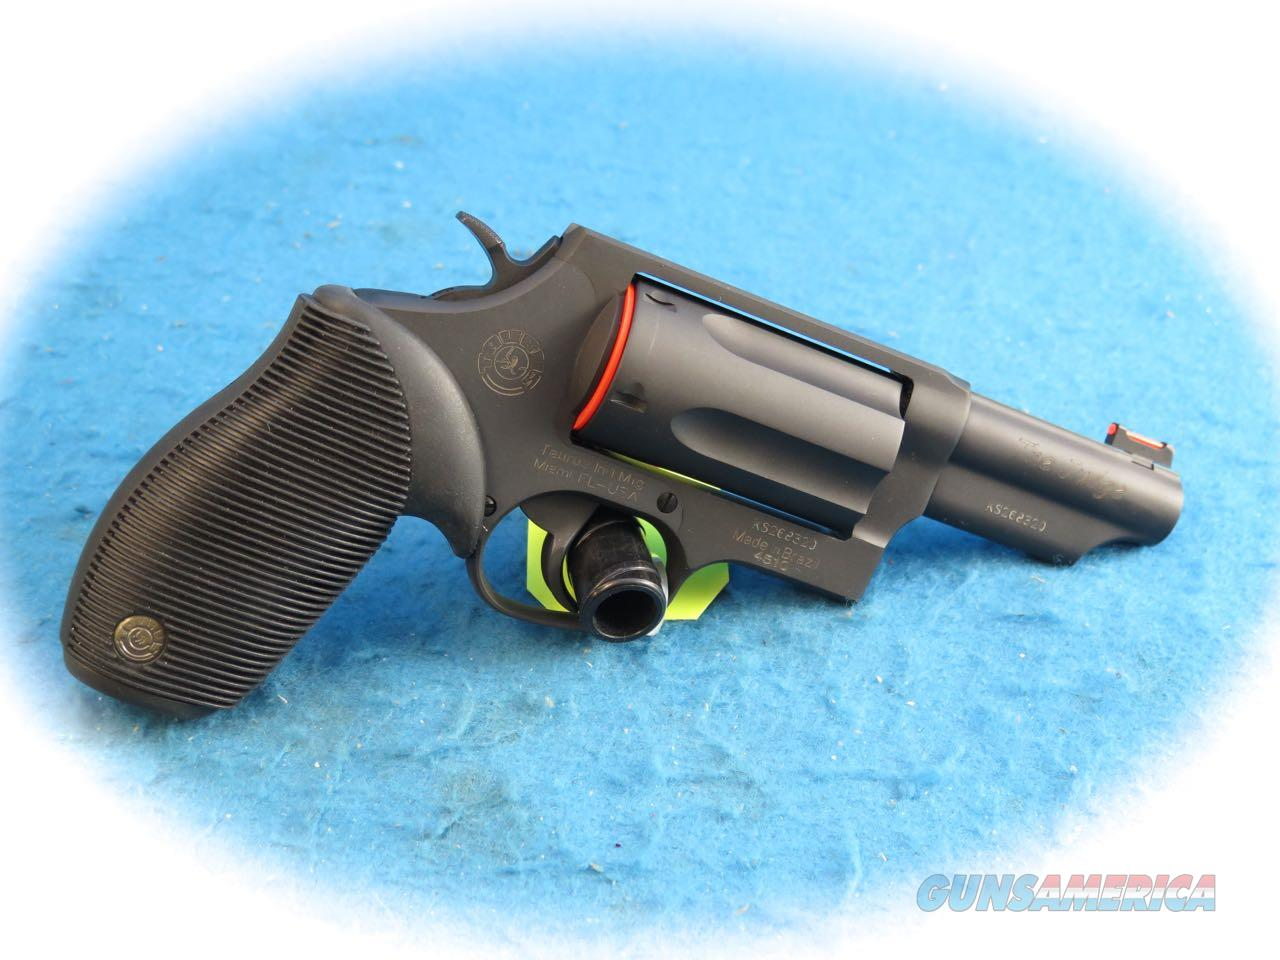 Taurus Judge Revolver .45 Colt/.410 Ga. Model 2-441031T **New**  Guns > Pistols > Taurus Pistols > Revolvers